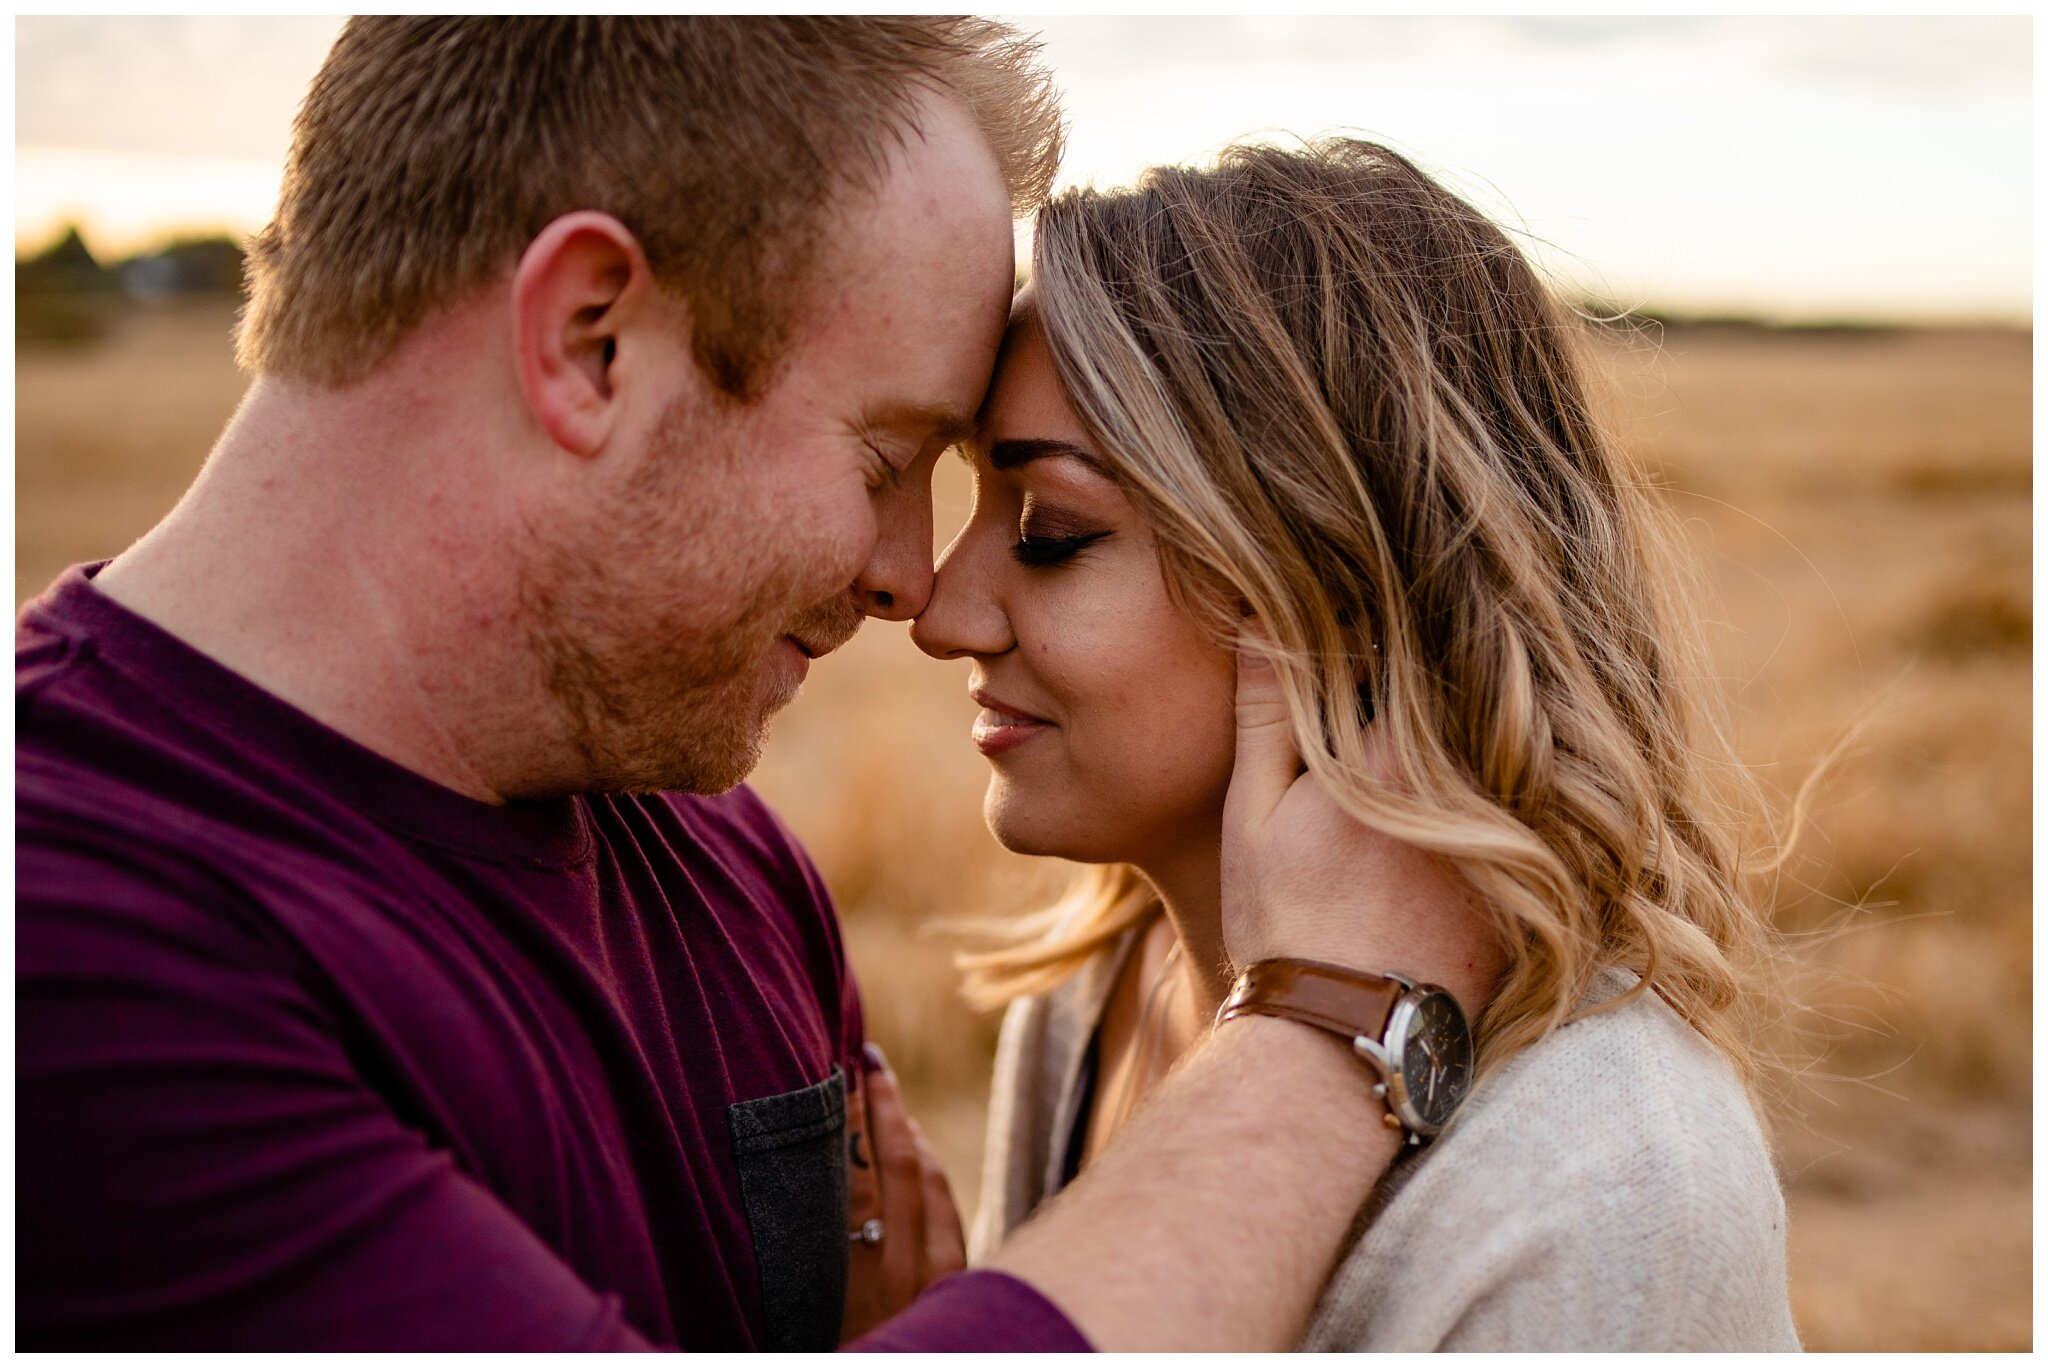 Edmonton Engagement Photographer Romantic Couples Photos Local YEG Strathcona County_0009.jpg